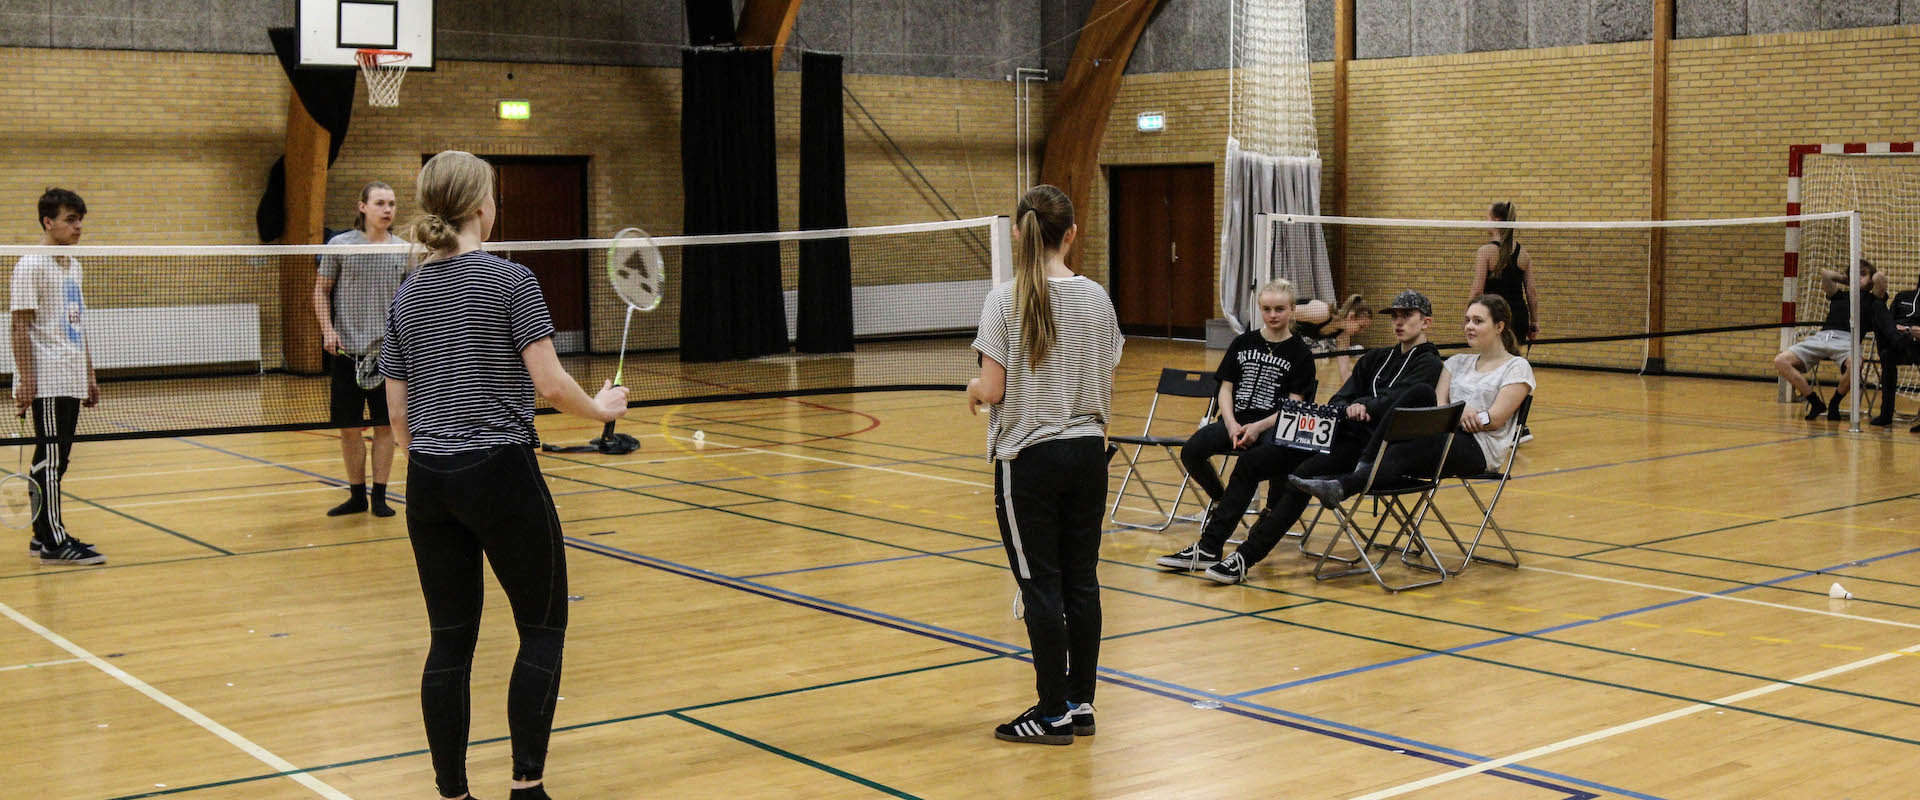 badminton efterskole